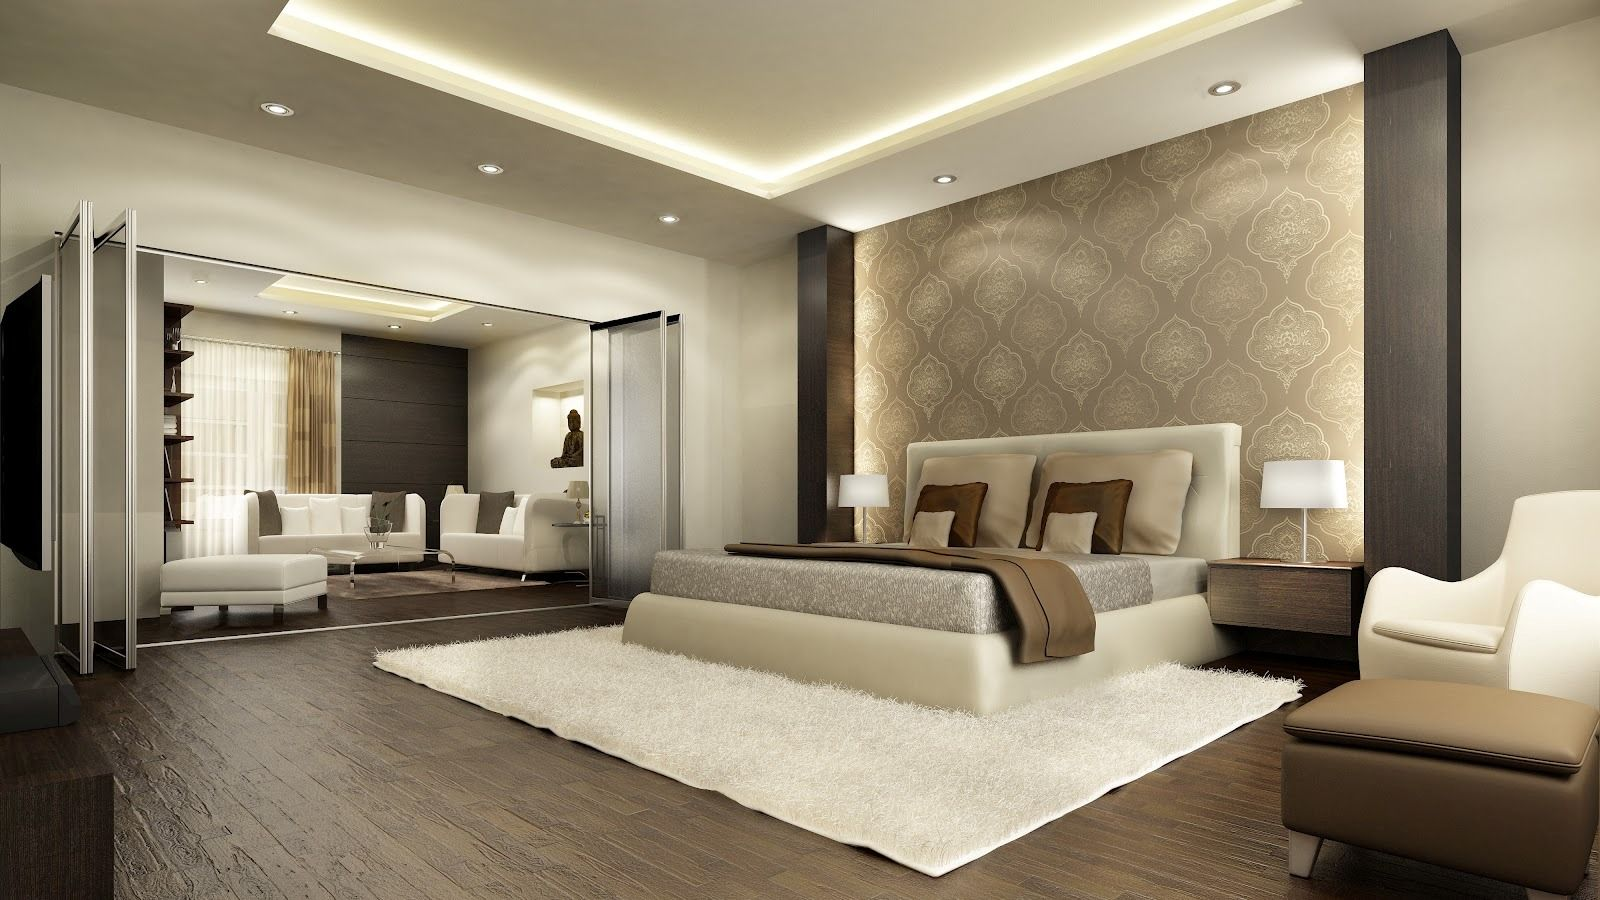 Modern Design For Bedroom 1000 Ideas About Modern Luxury Bedroom On Pinterest Bedrooms